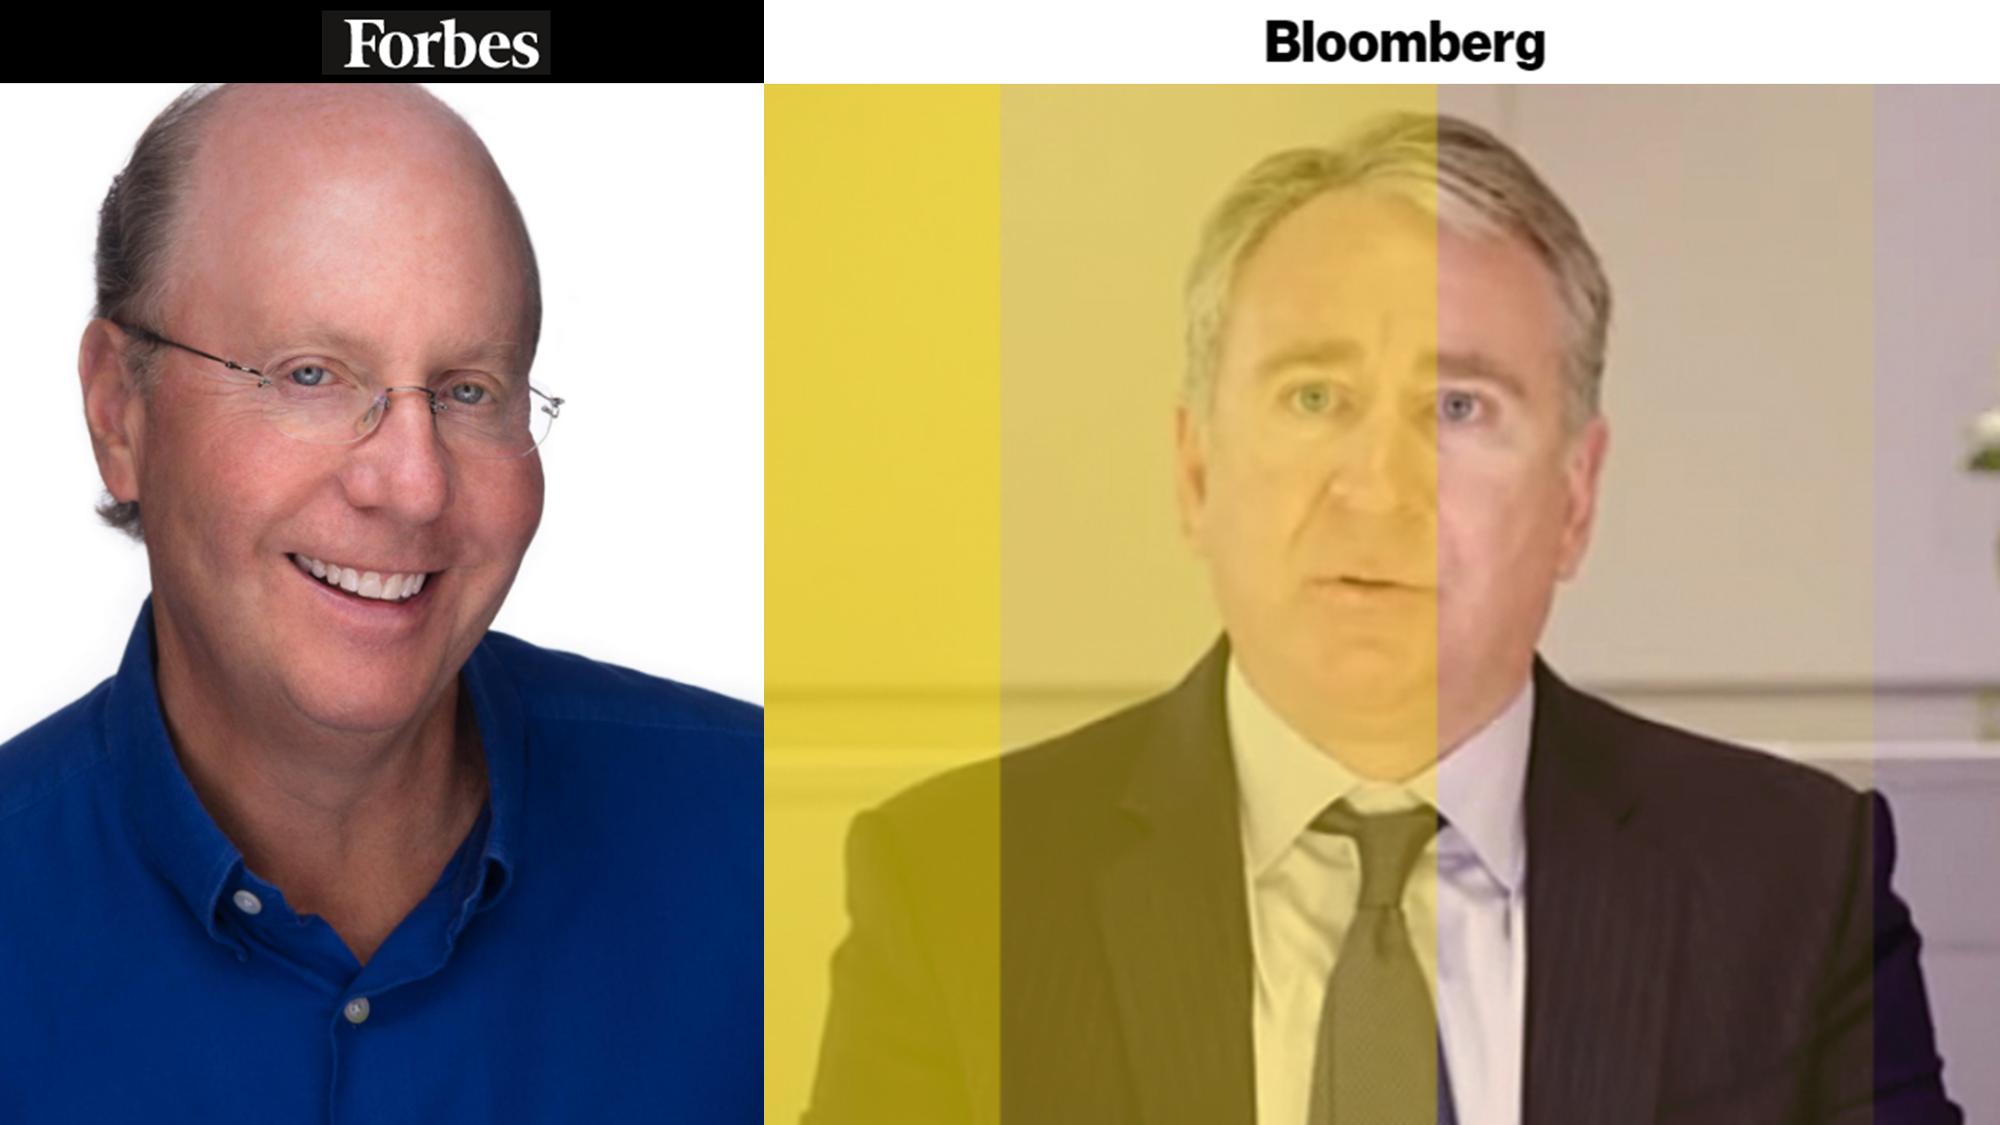 Bloomberg, Forbes: Alphacution Scores Press Twofer